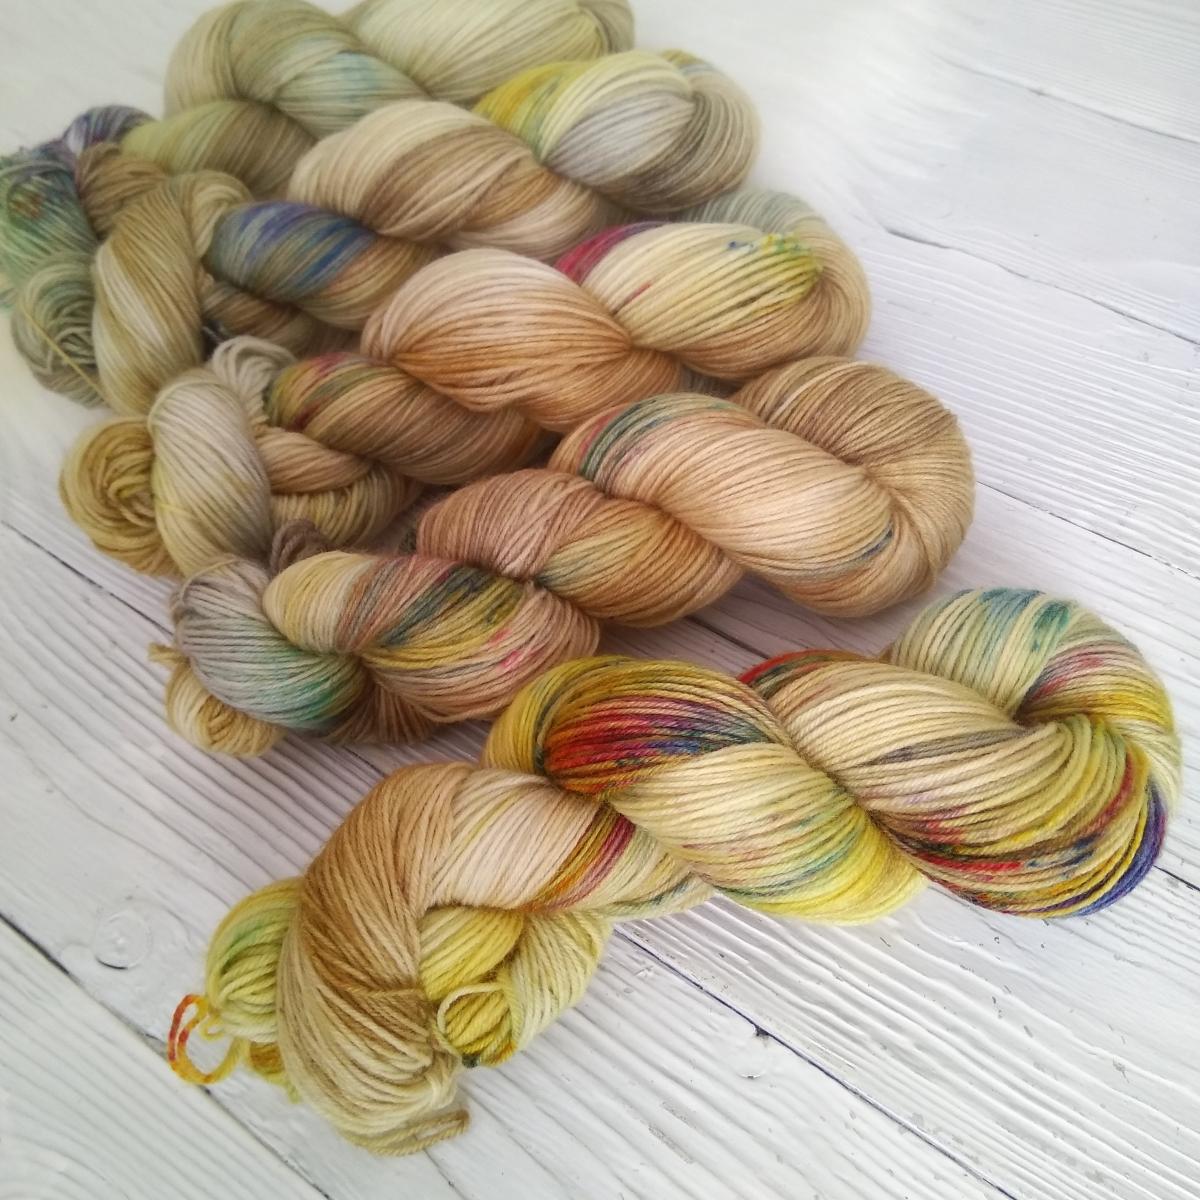 woodico.pro hand dyed yarn 032 6 1200x1200 - Hand dyed yarn / 032